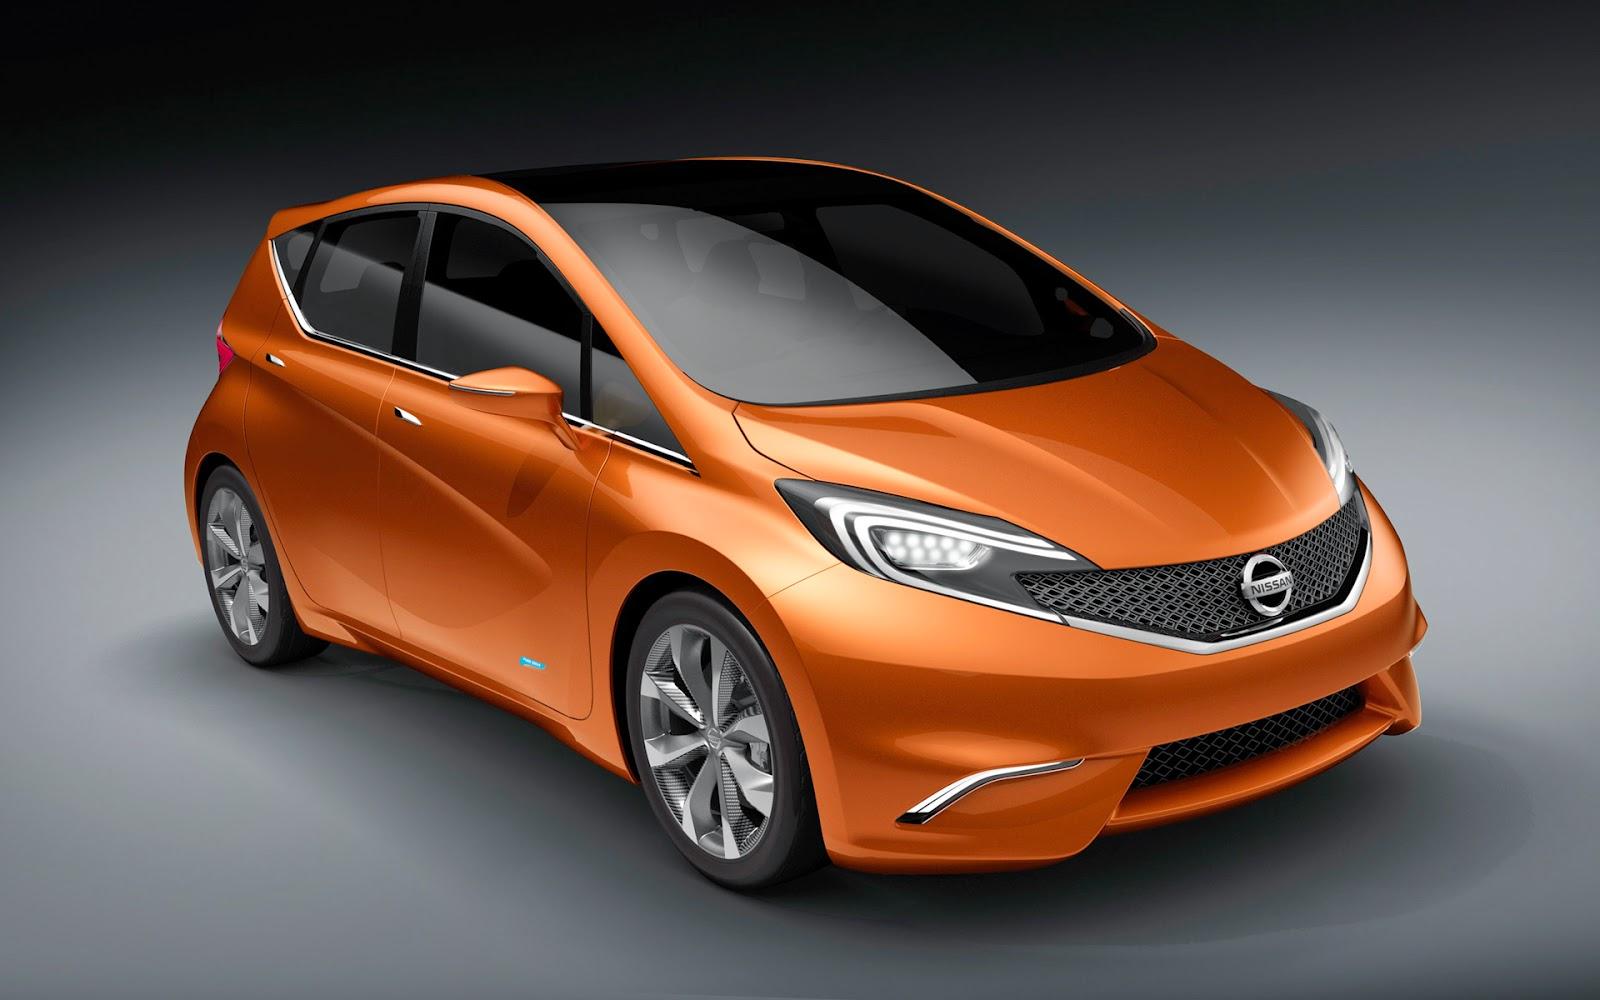 Asuransi Mobil Nissan: Asuransi Mobil Exclusive Nissan